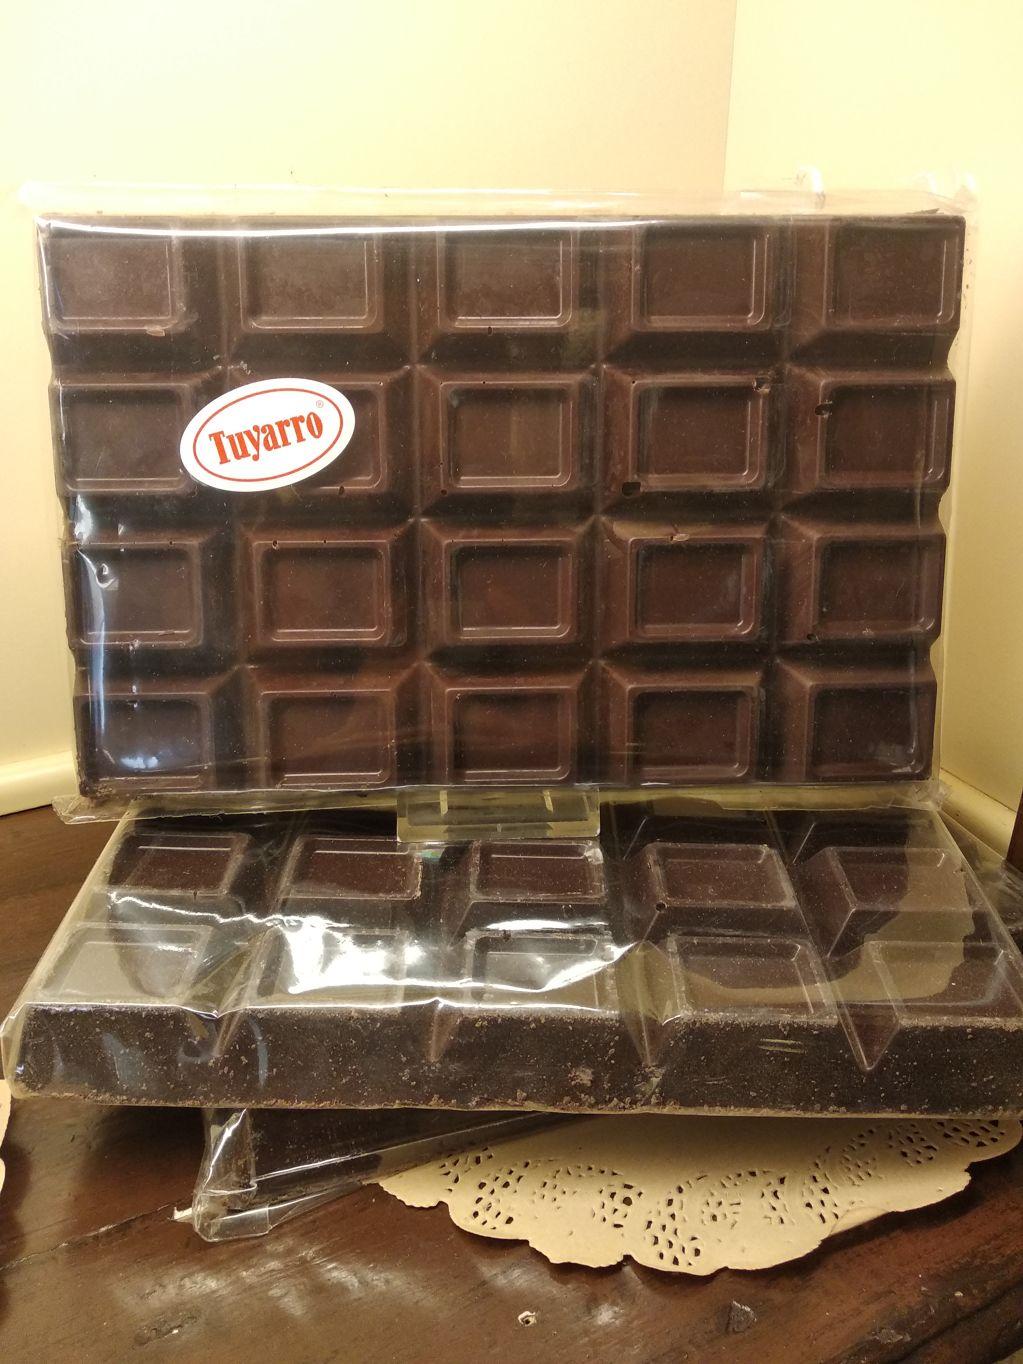 Xocolata cobertura 1000 gr. - 47f24-IMG_20200901_100328.jpg